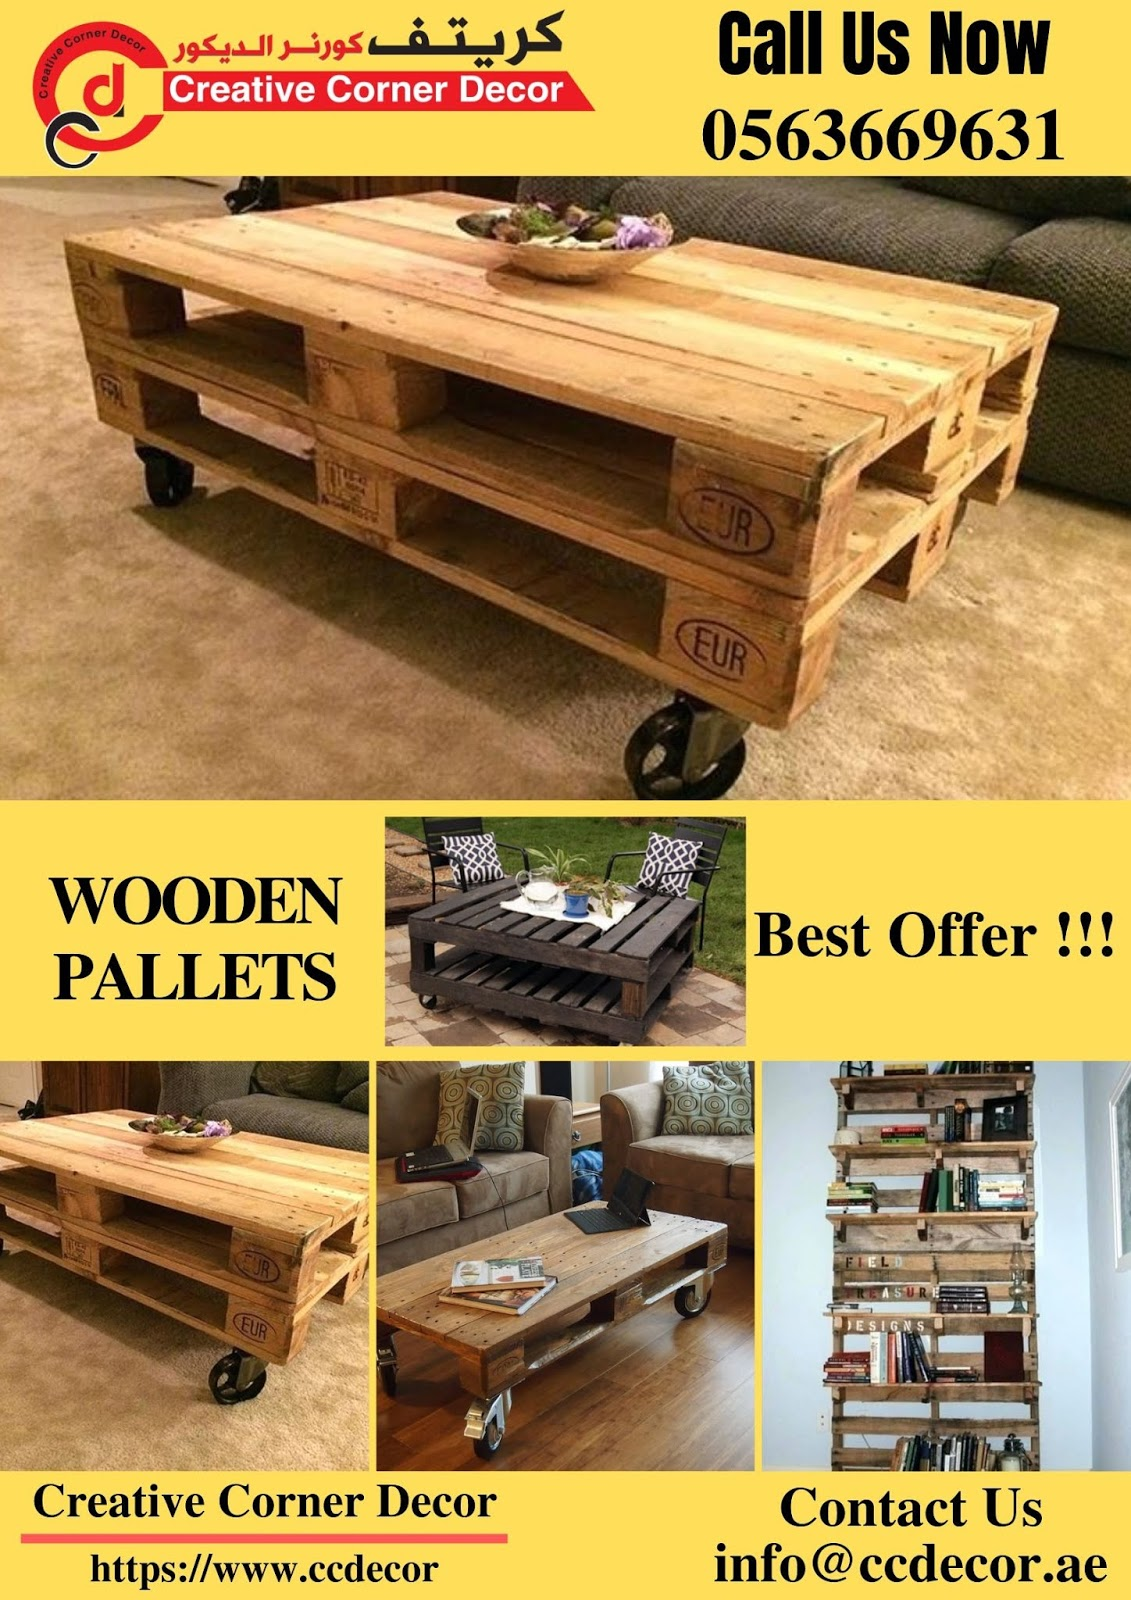 Wooden Pallets Suppliers in Dubai, Abu Dhabi, Sharjah ...